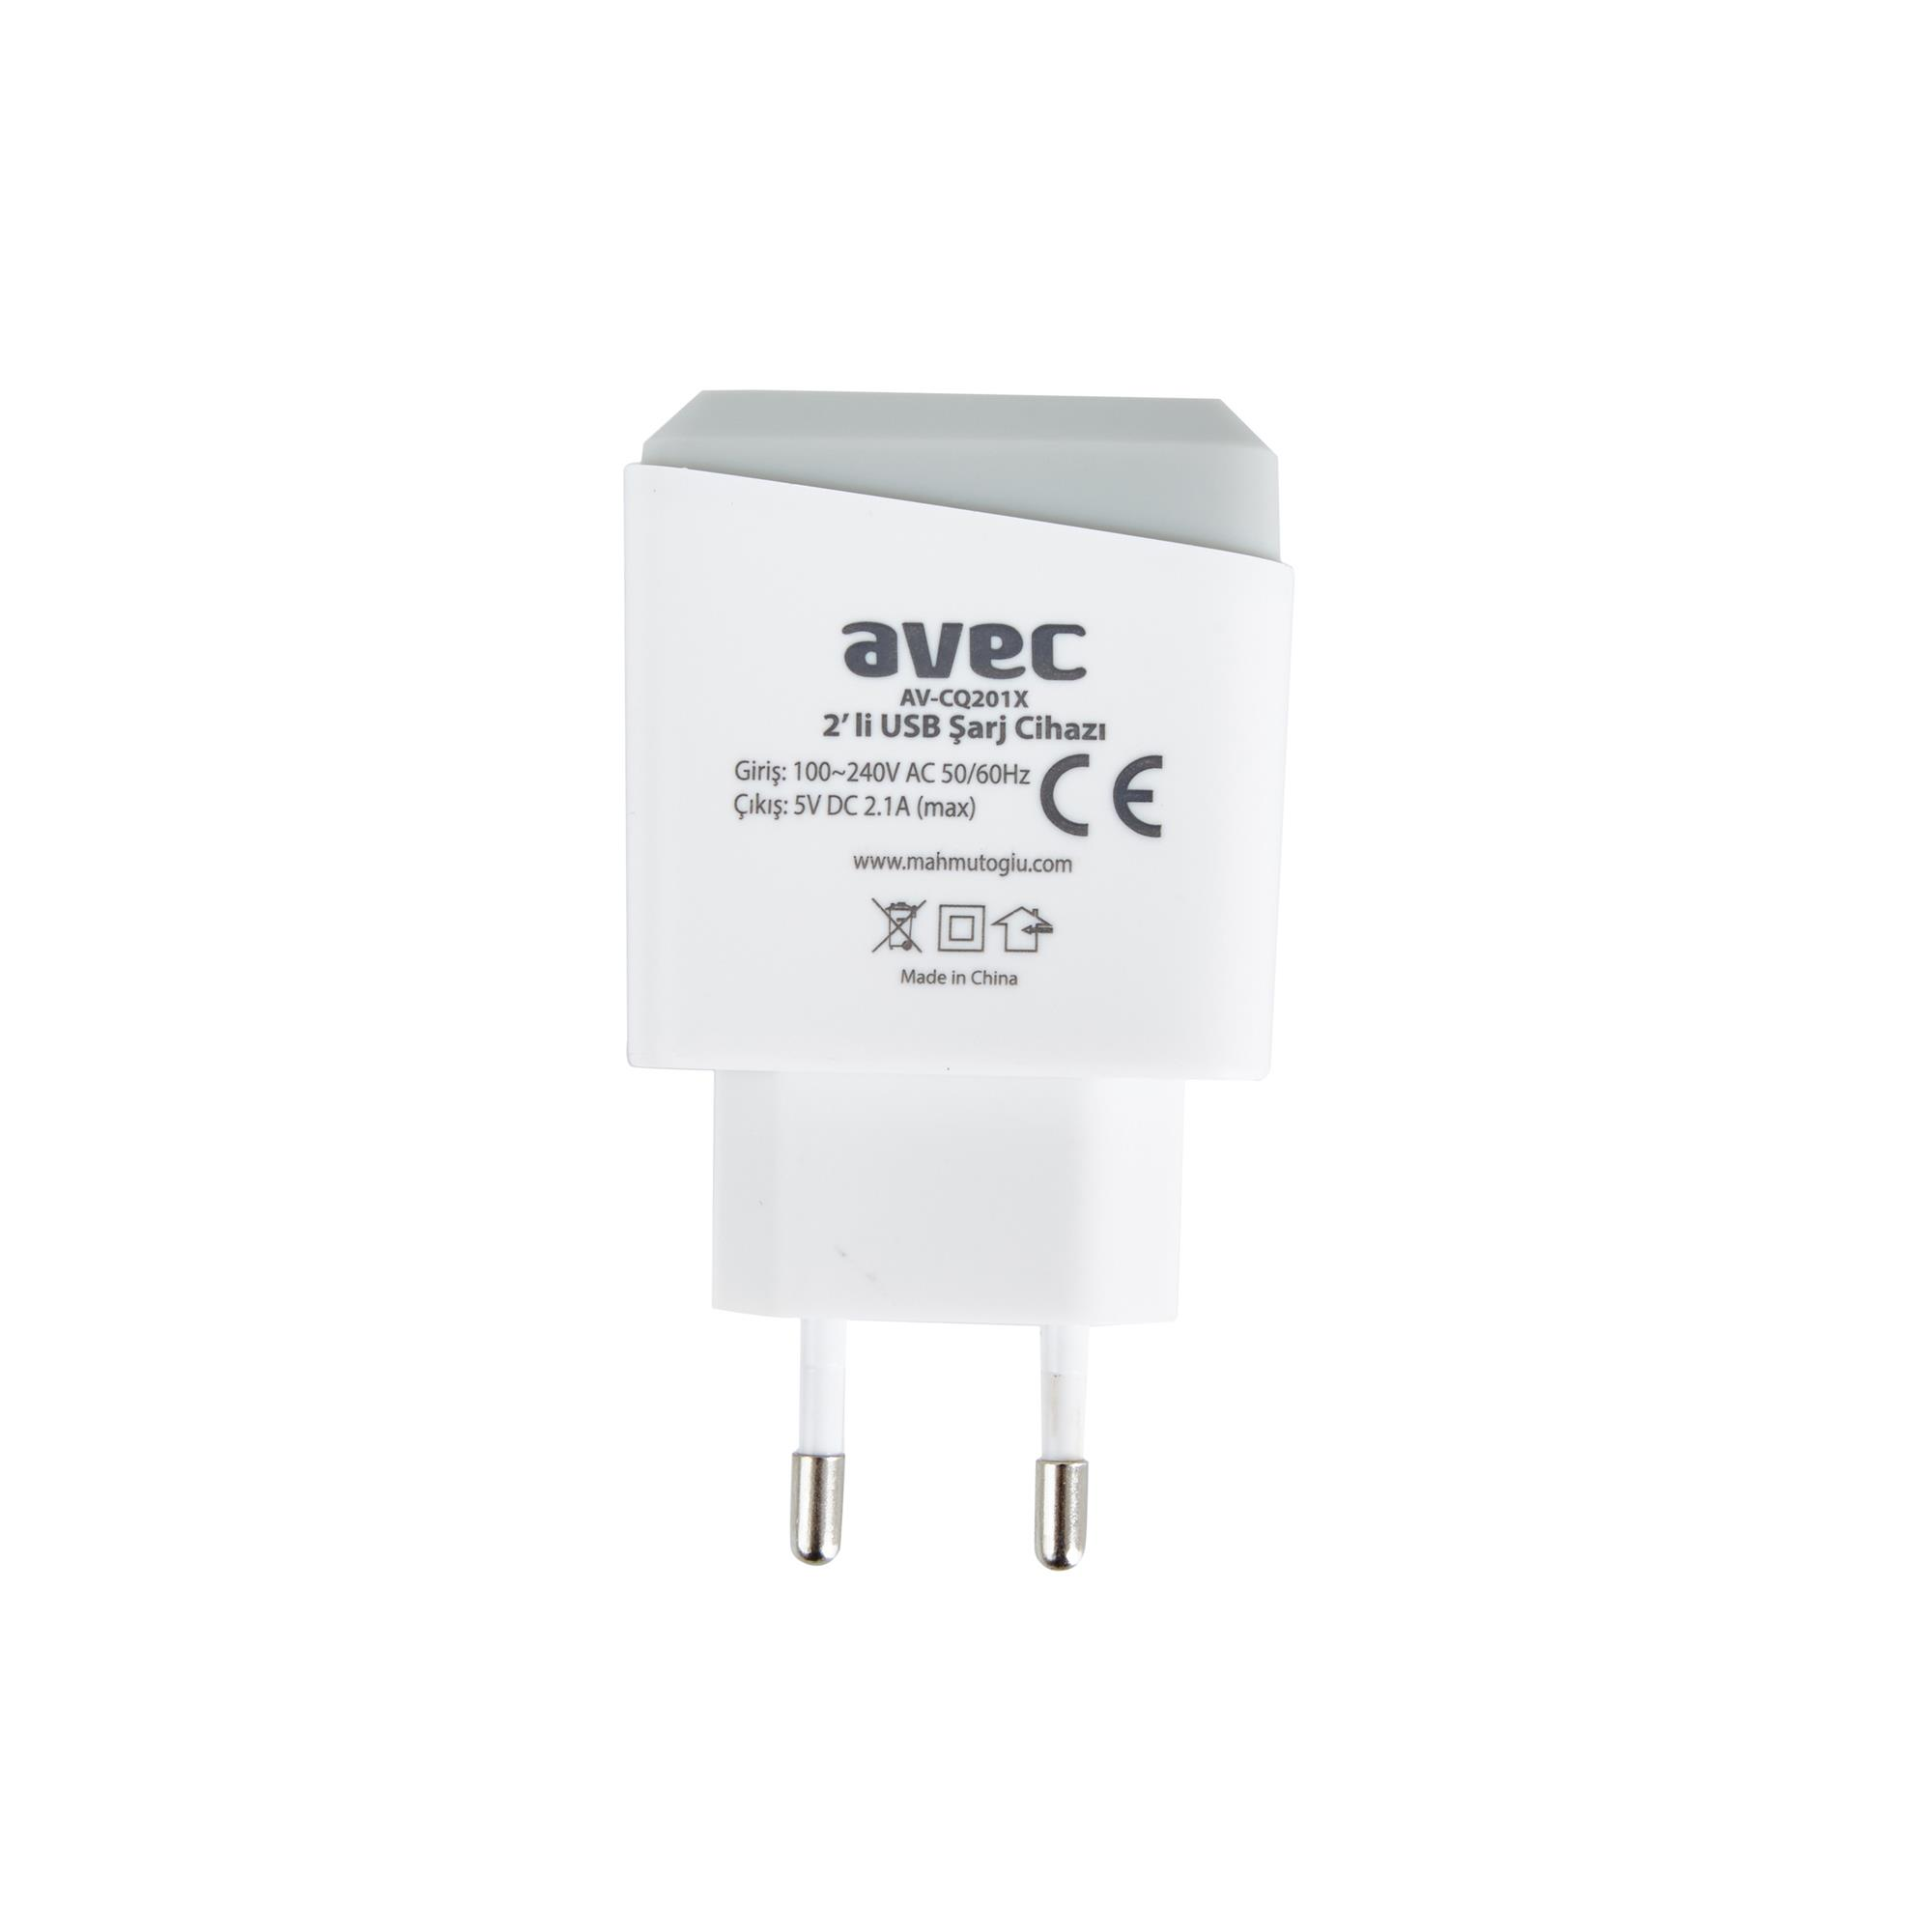 AVEC AV-CQ201X 220V ÇİFTLİ USB ŞARJ CİHAZI